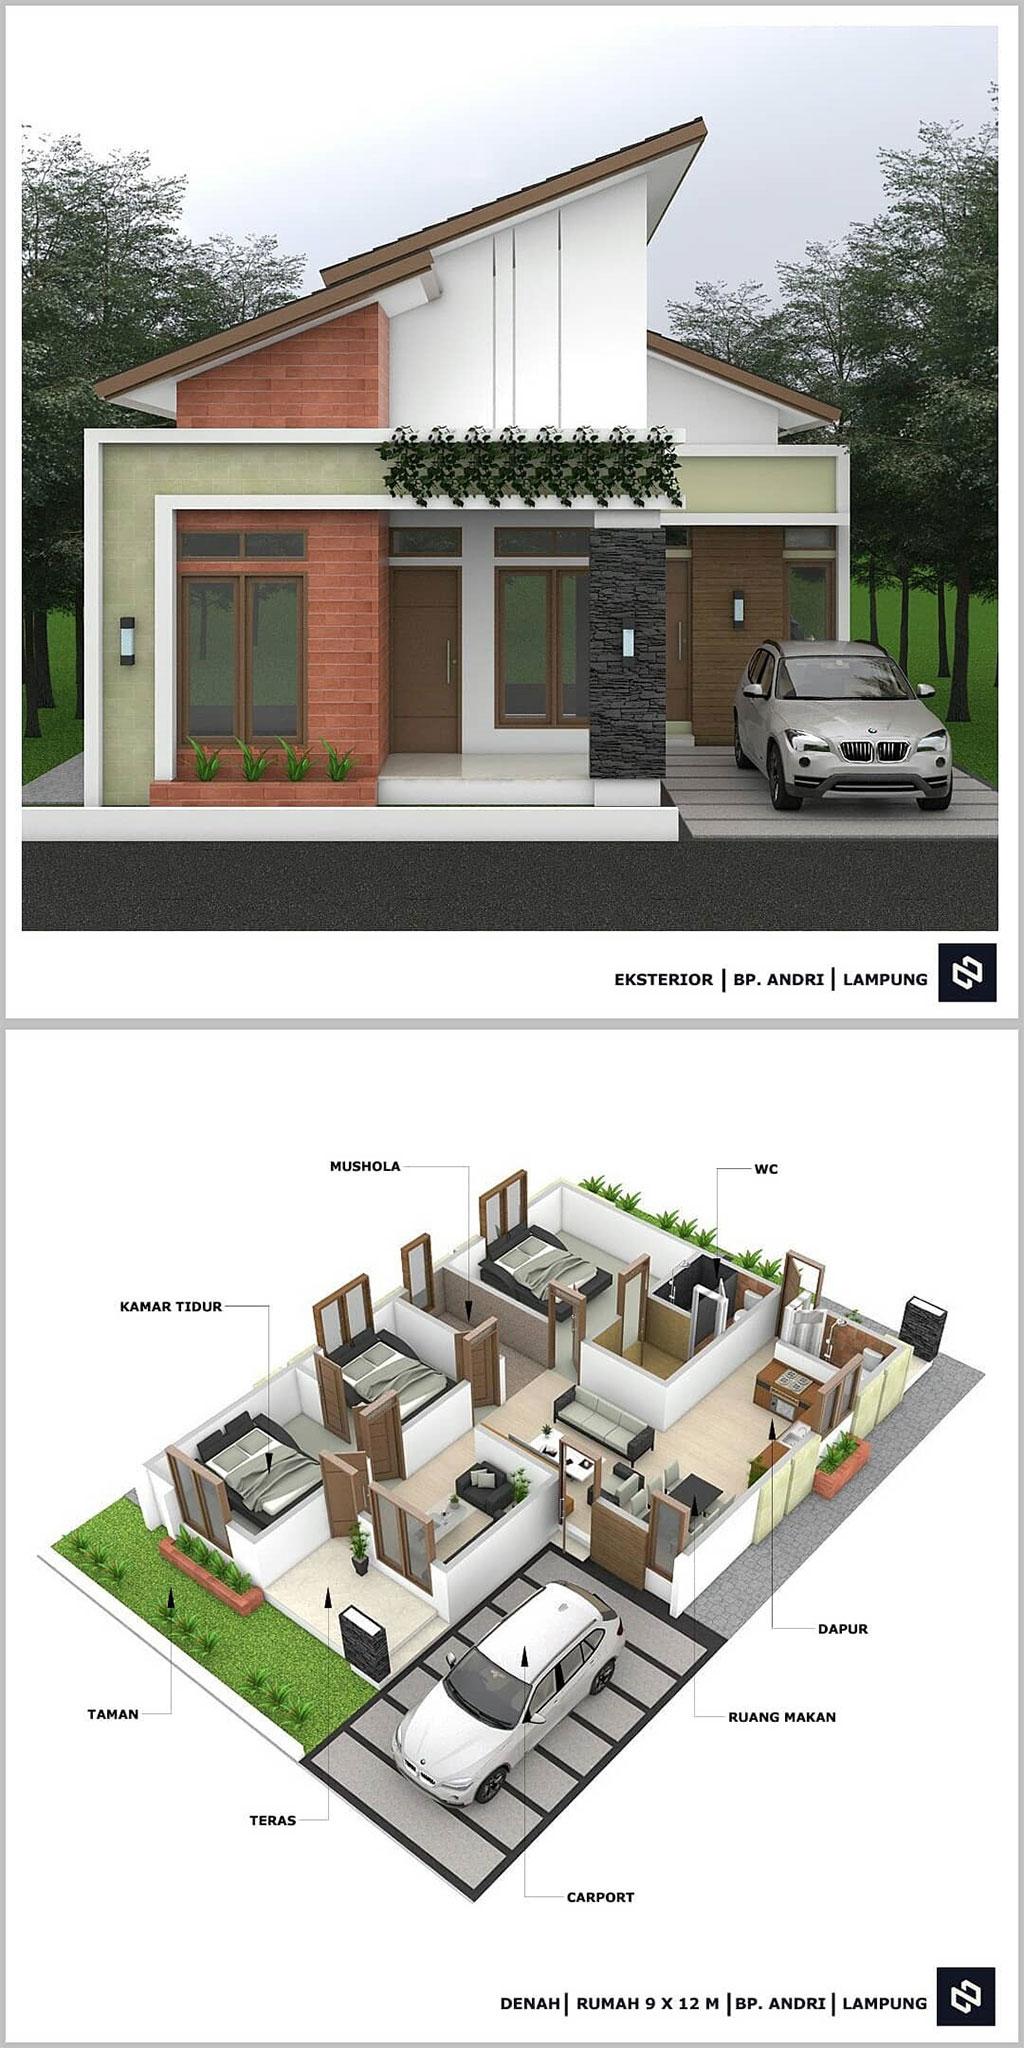 Gambar Denah Rumah Minimalis 3 Kamar Tidur 1 Lantai Terbaru Beserta Keterangannya Ukuran 9 x 12 m